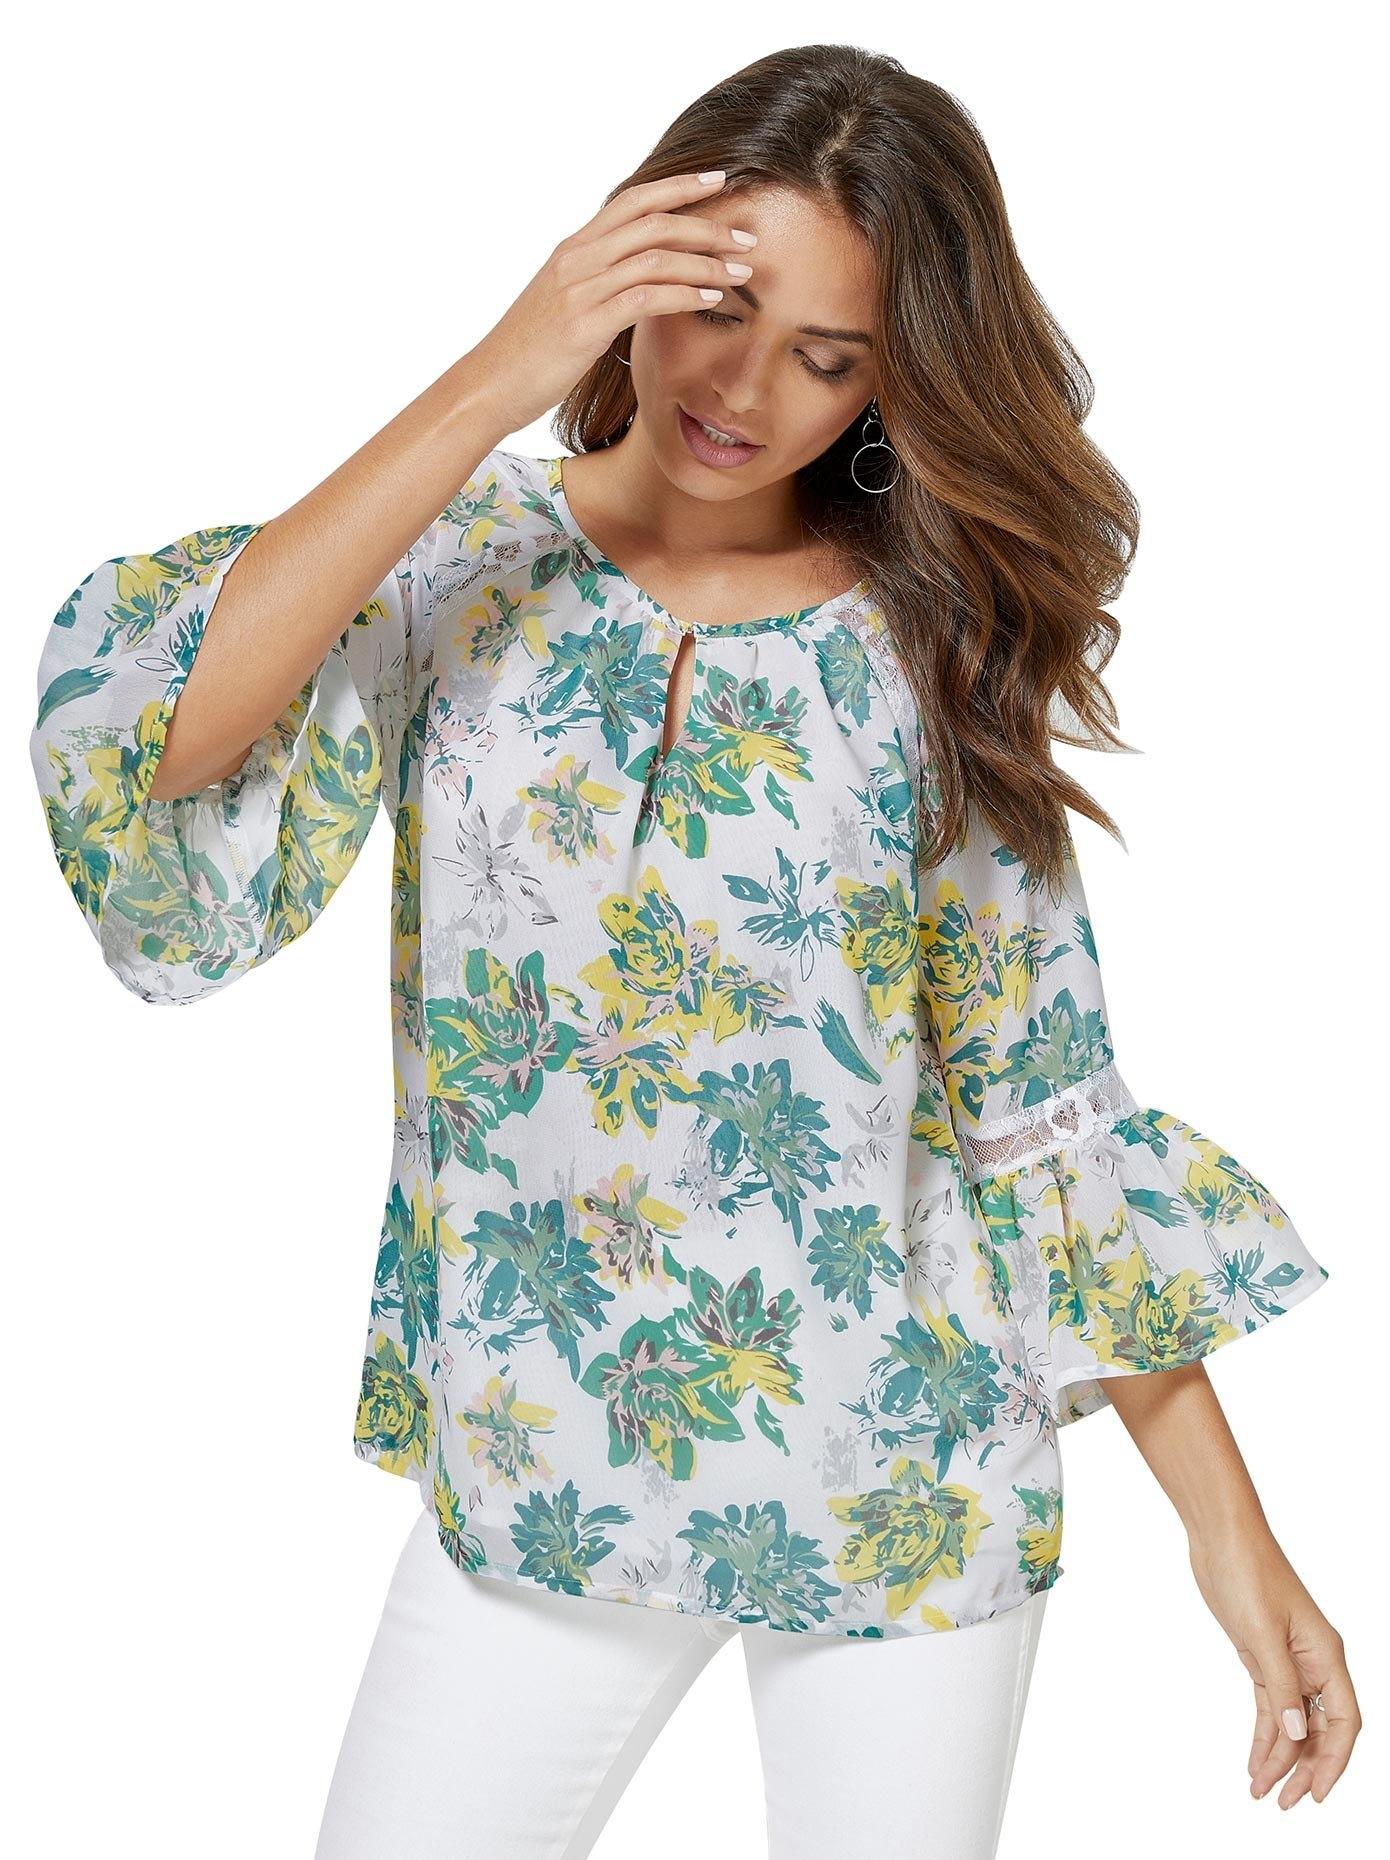 creation L gedessineerde blouse online kopen op otto.nl